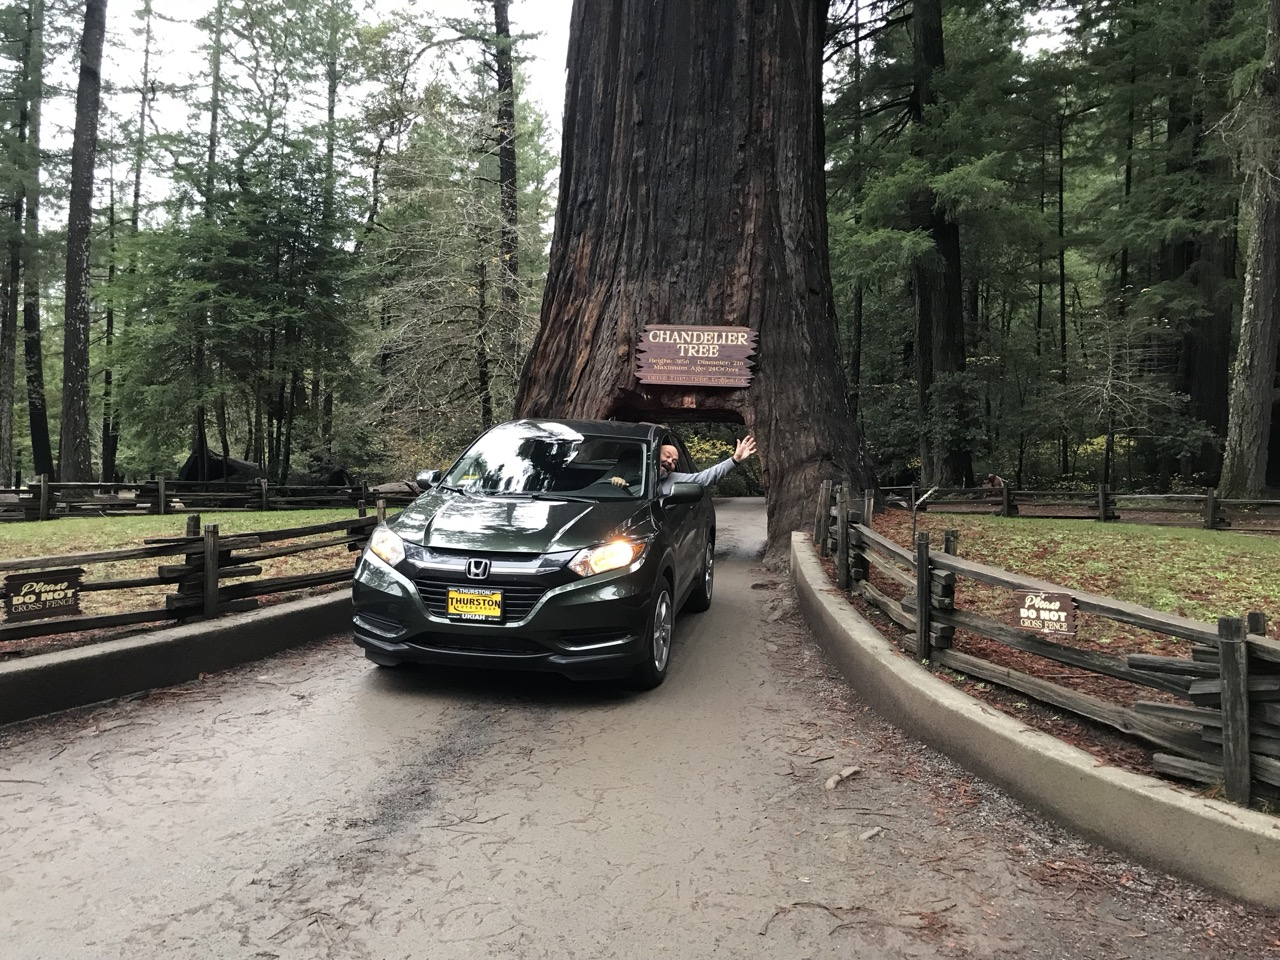 New car? Drive-through tree!